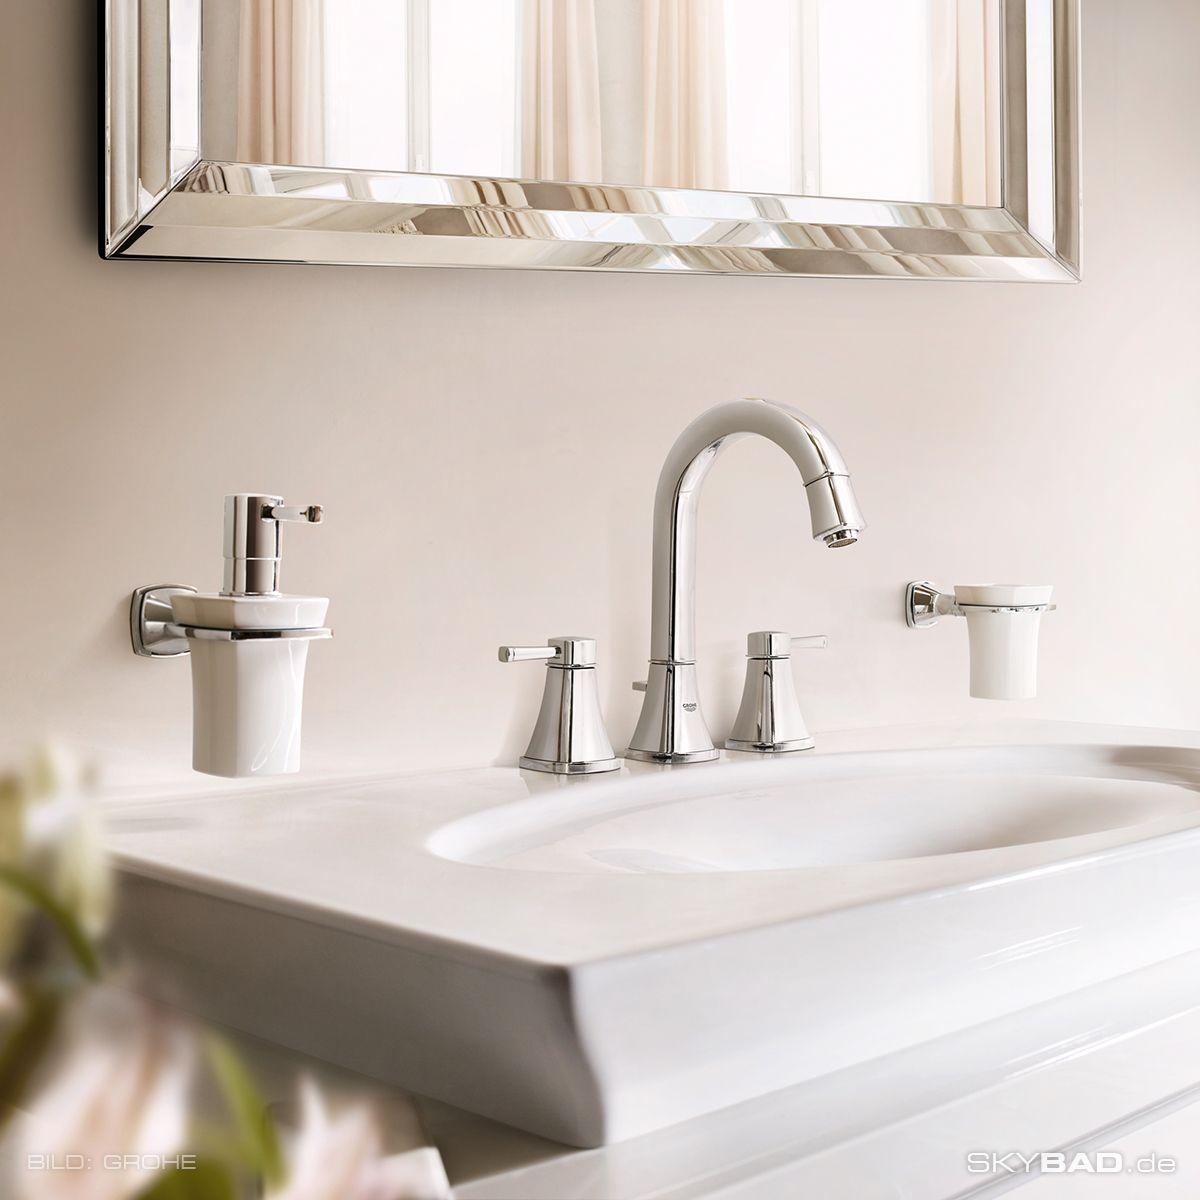 Grohe Grandera Bath Accessoires Shop it here: https://www.skybad.de ...